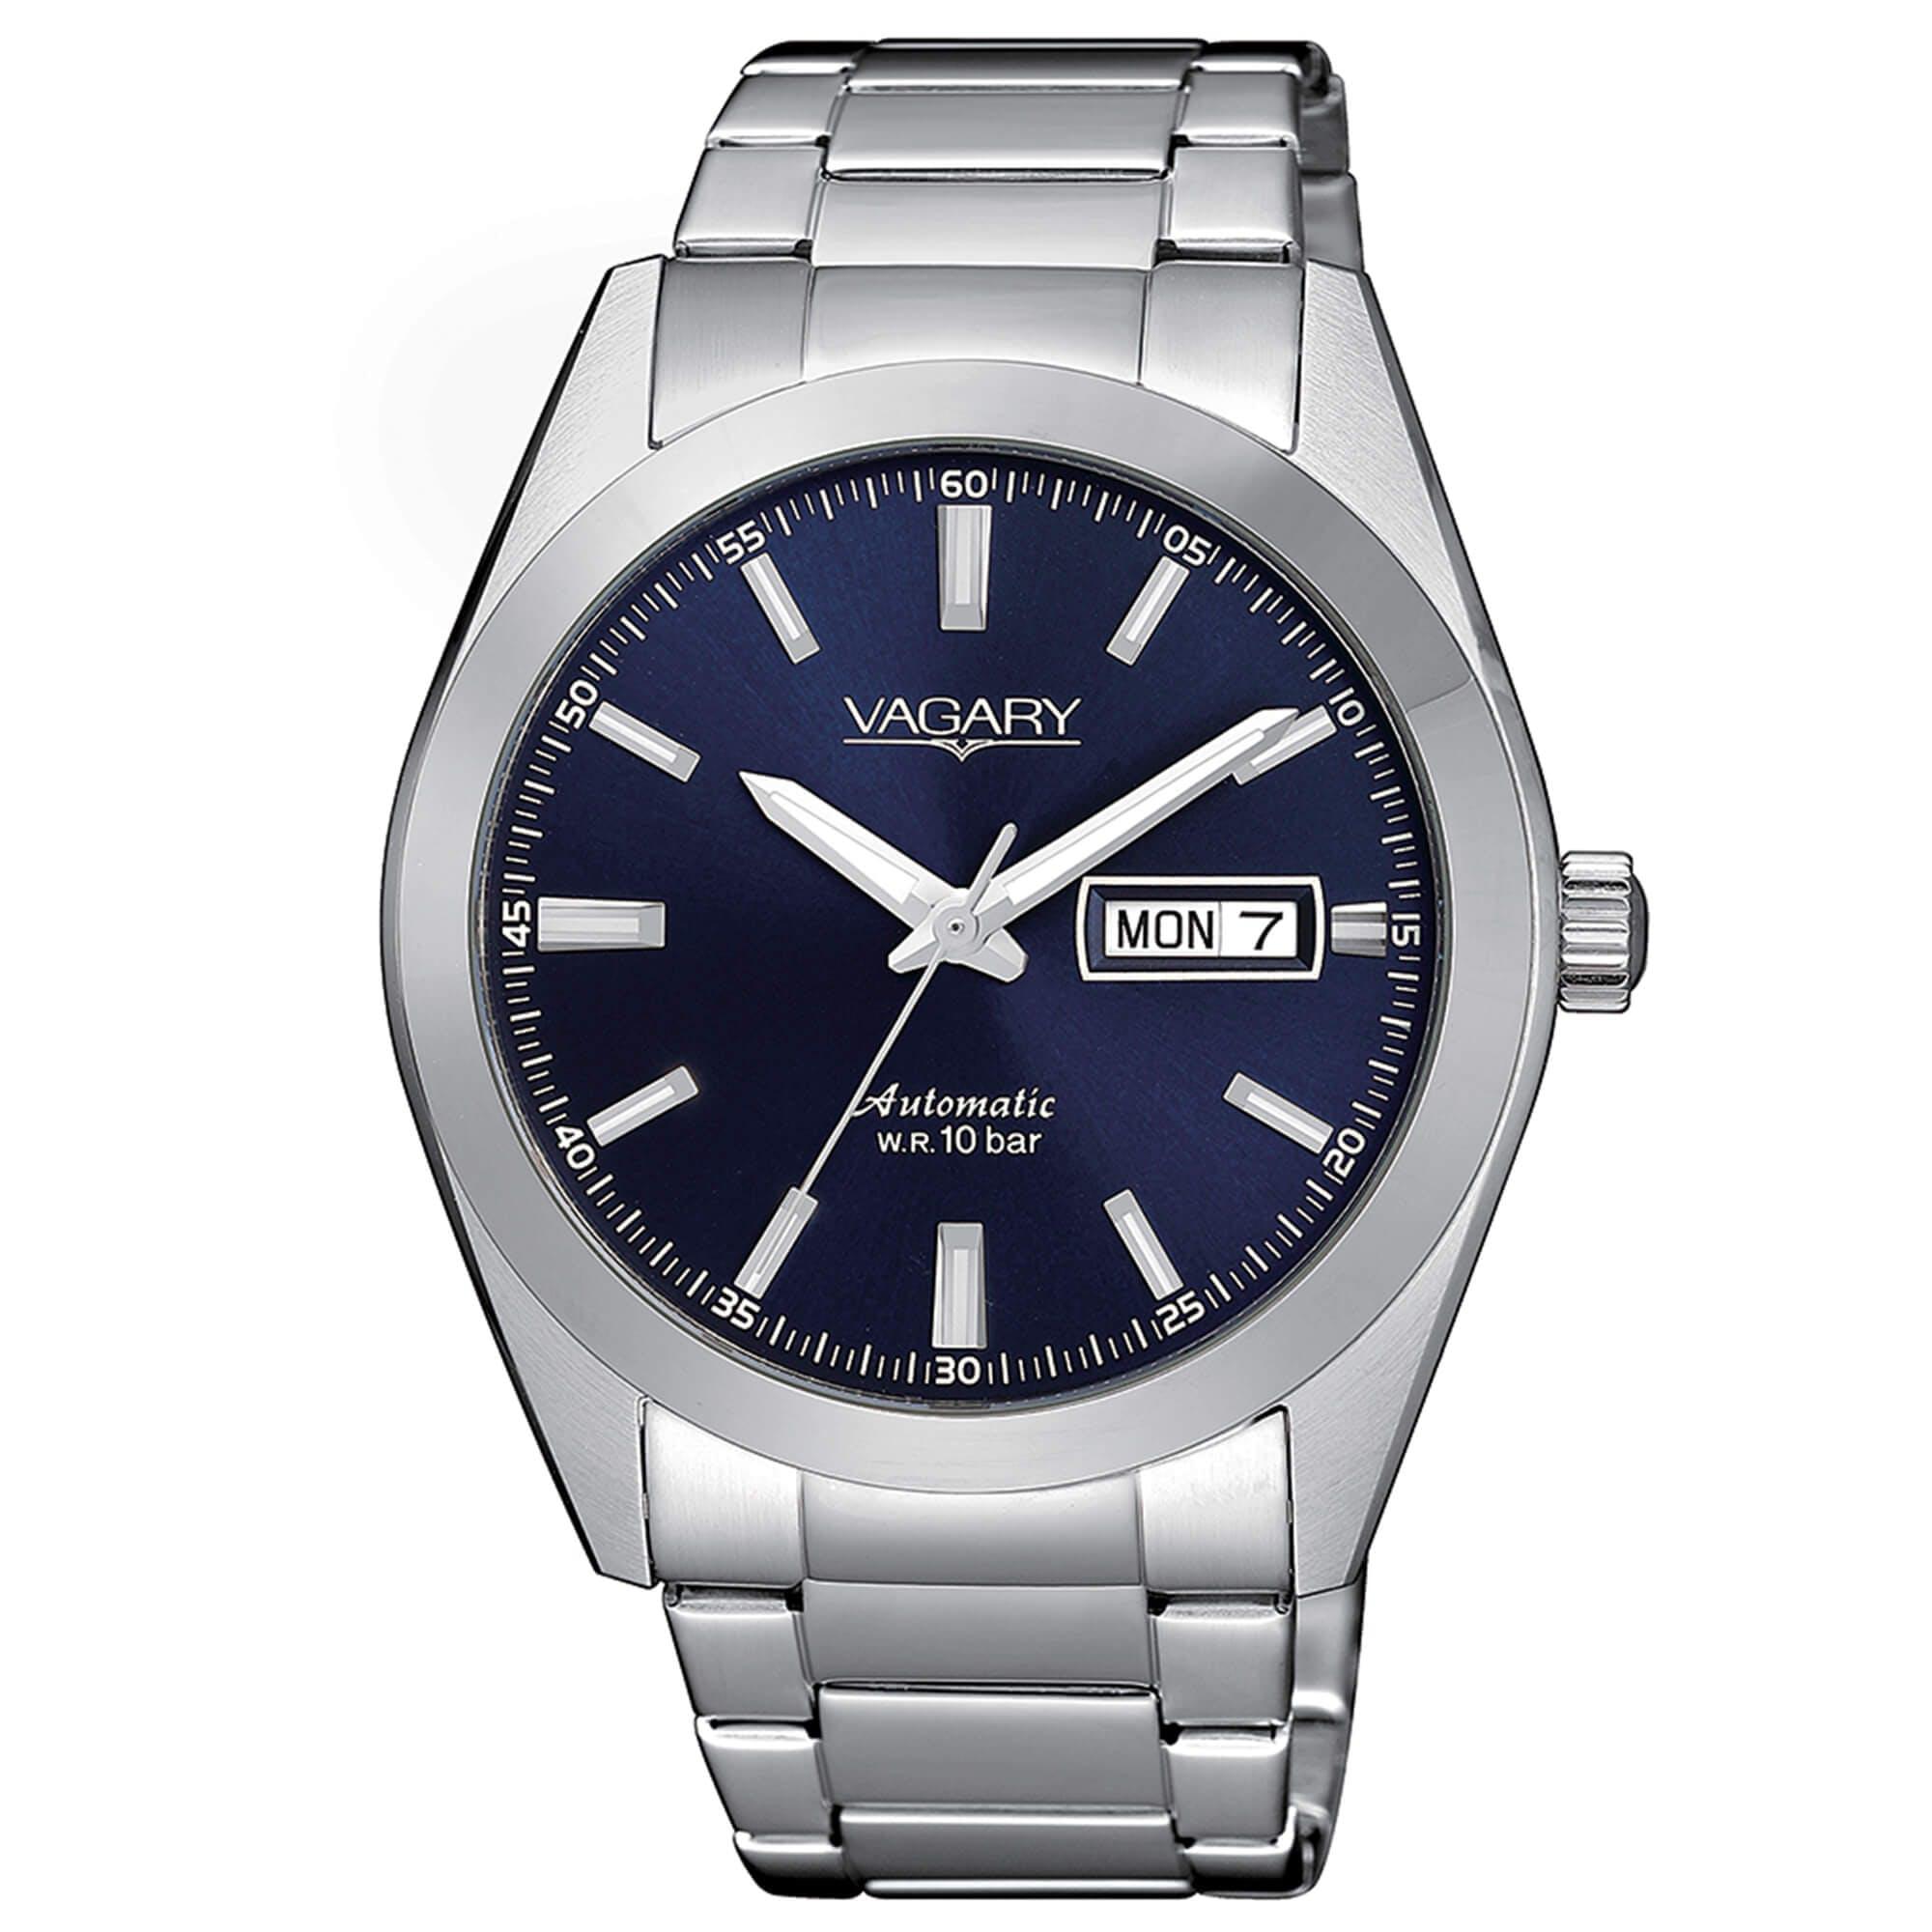 Orologio Vagary G.Matic 101